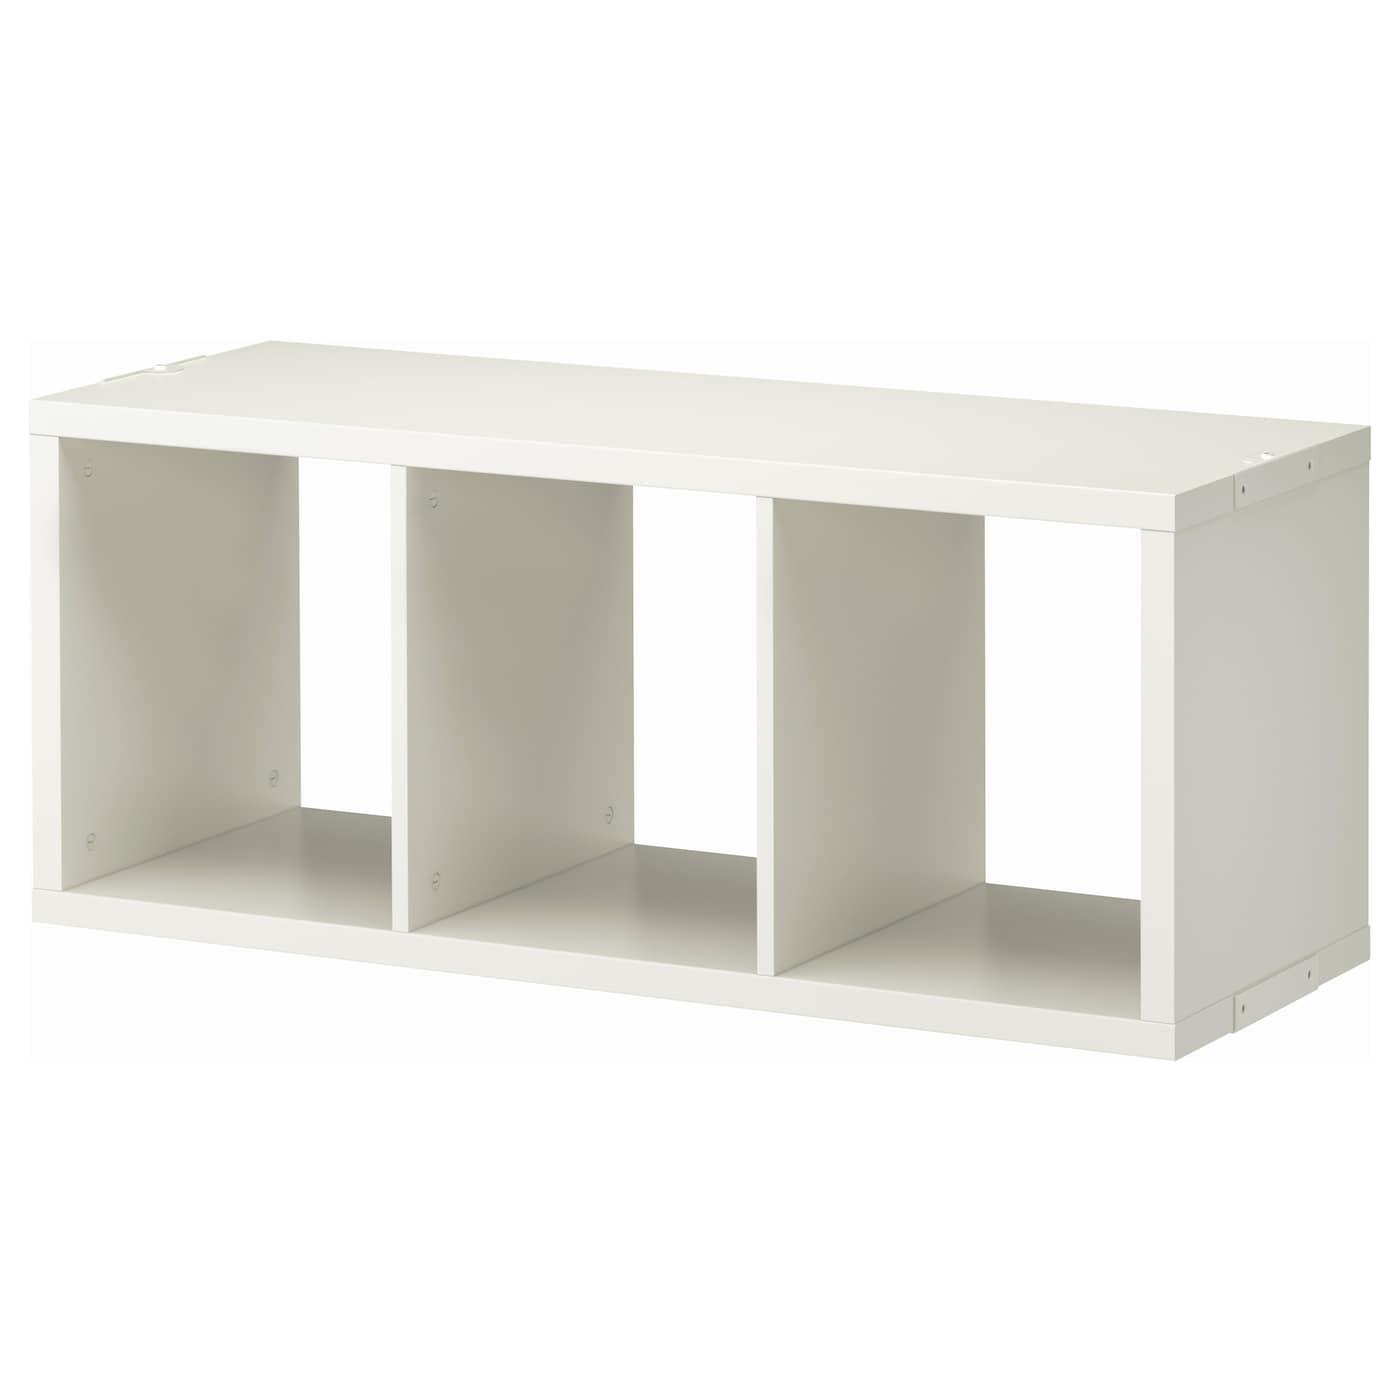 syst m stolmen v echny sti katalog 2016 n bytek online. Black Bedroom Furniture Sets. Home Design Ideas